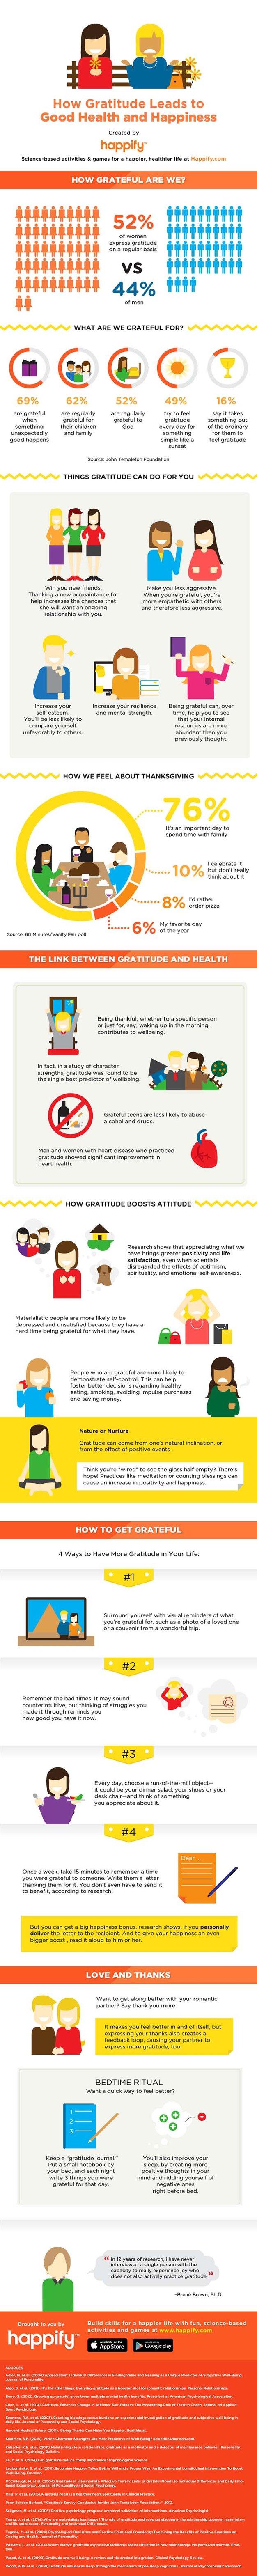 gratitude-infographic